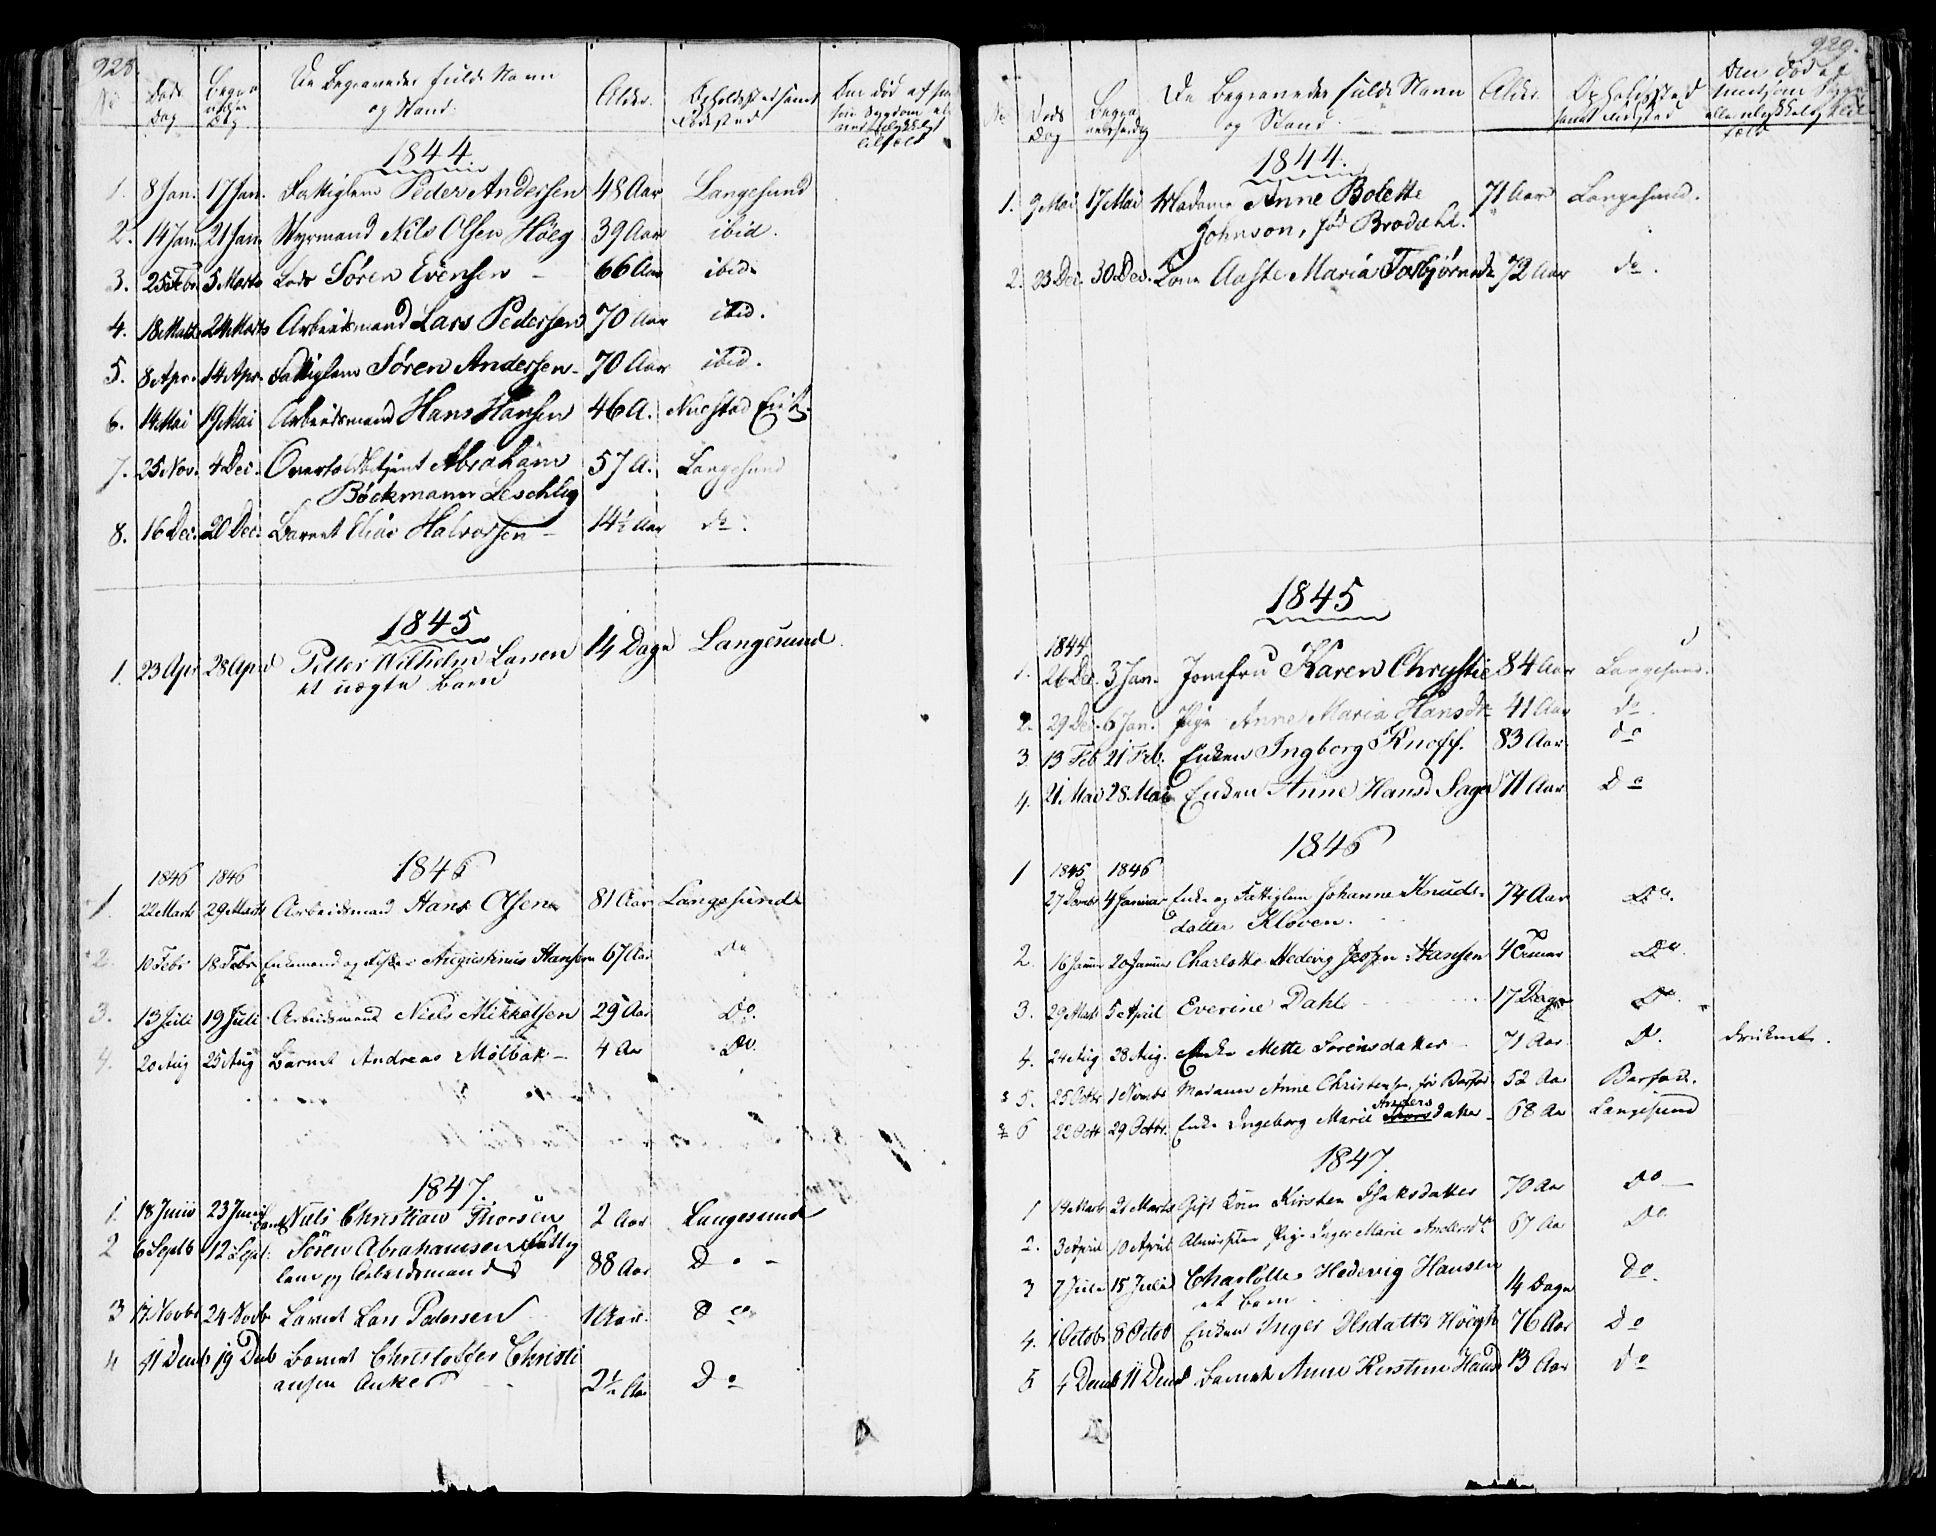 SAKO, Bamble kirkebøker, F/Fa/L0004: Ministerialbok nr. I 4, 1834-1853, s. 928-929